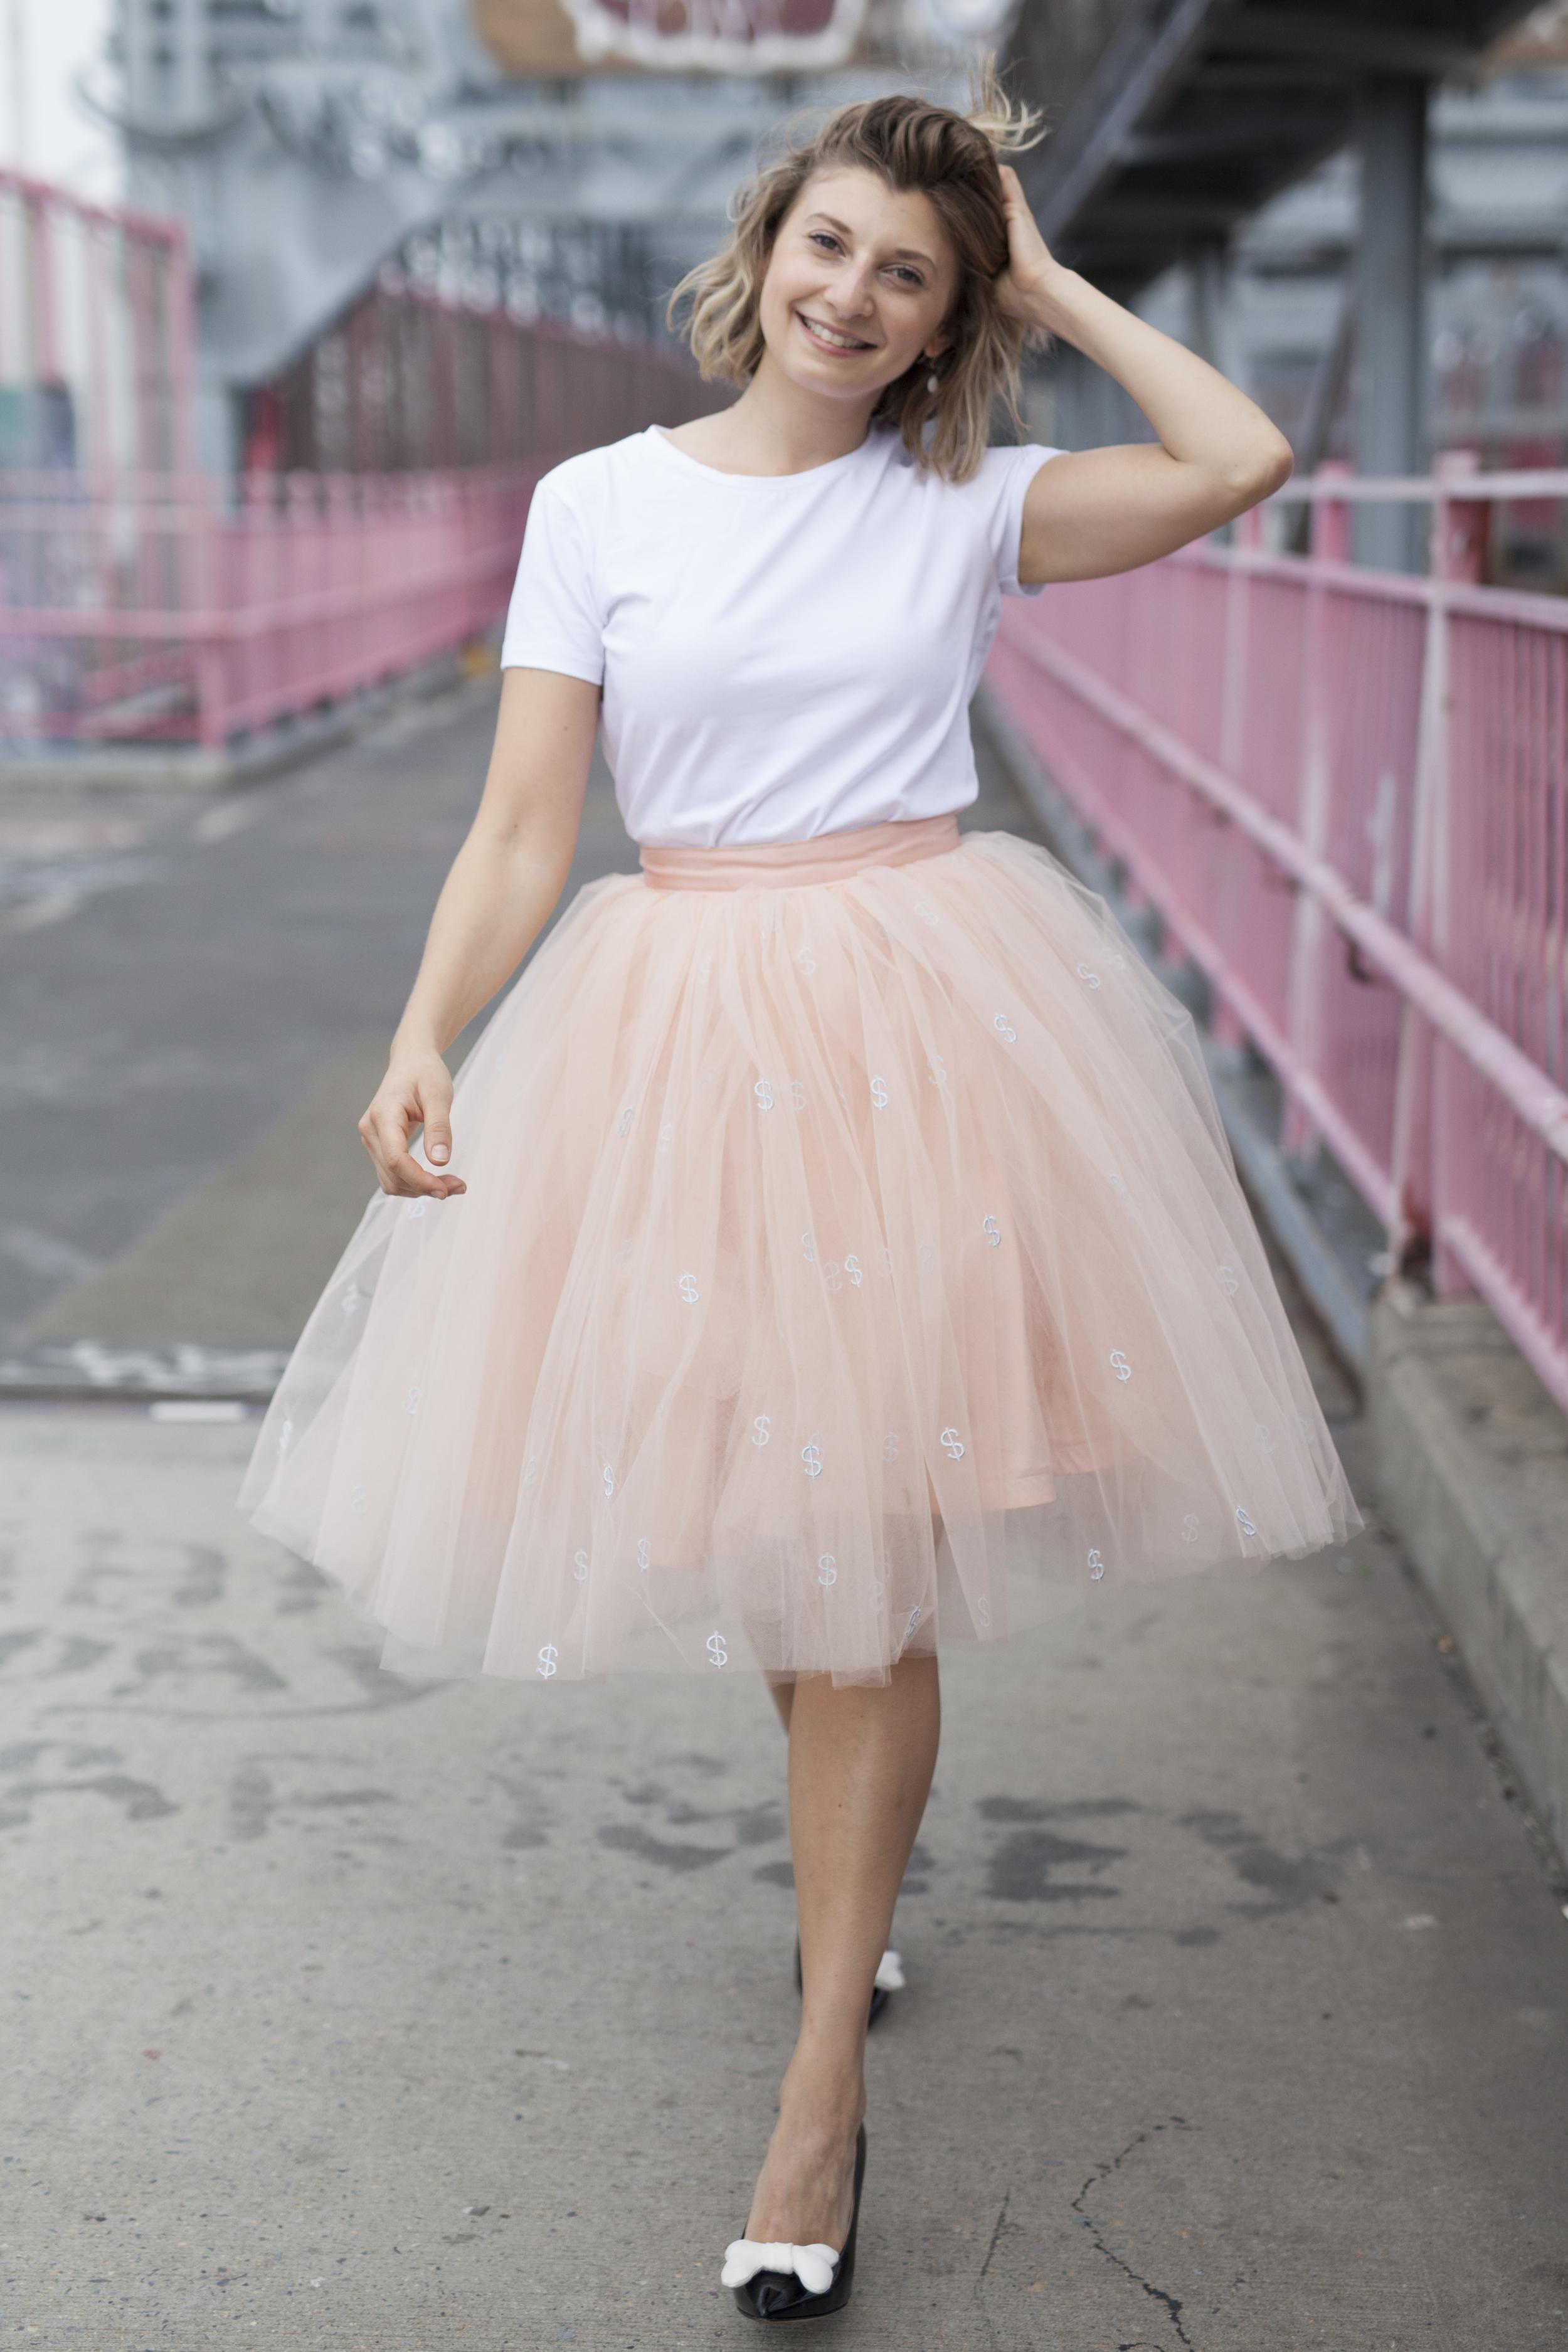 This is Lisa on the Williamsburg bridge wearing the CUPCAKE$$ skirt. This photo was taken by Megan Merkley.